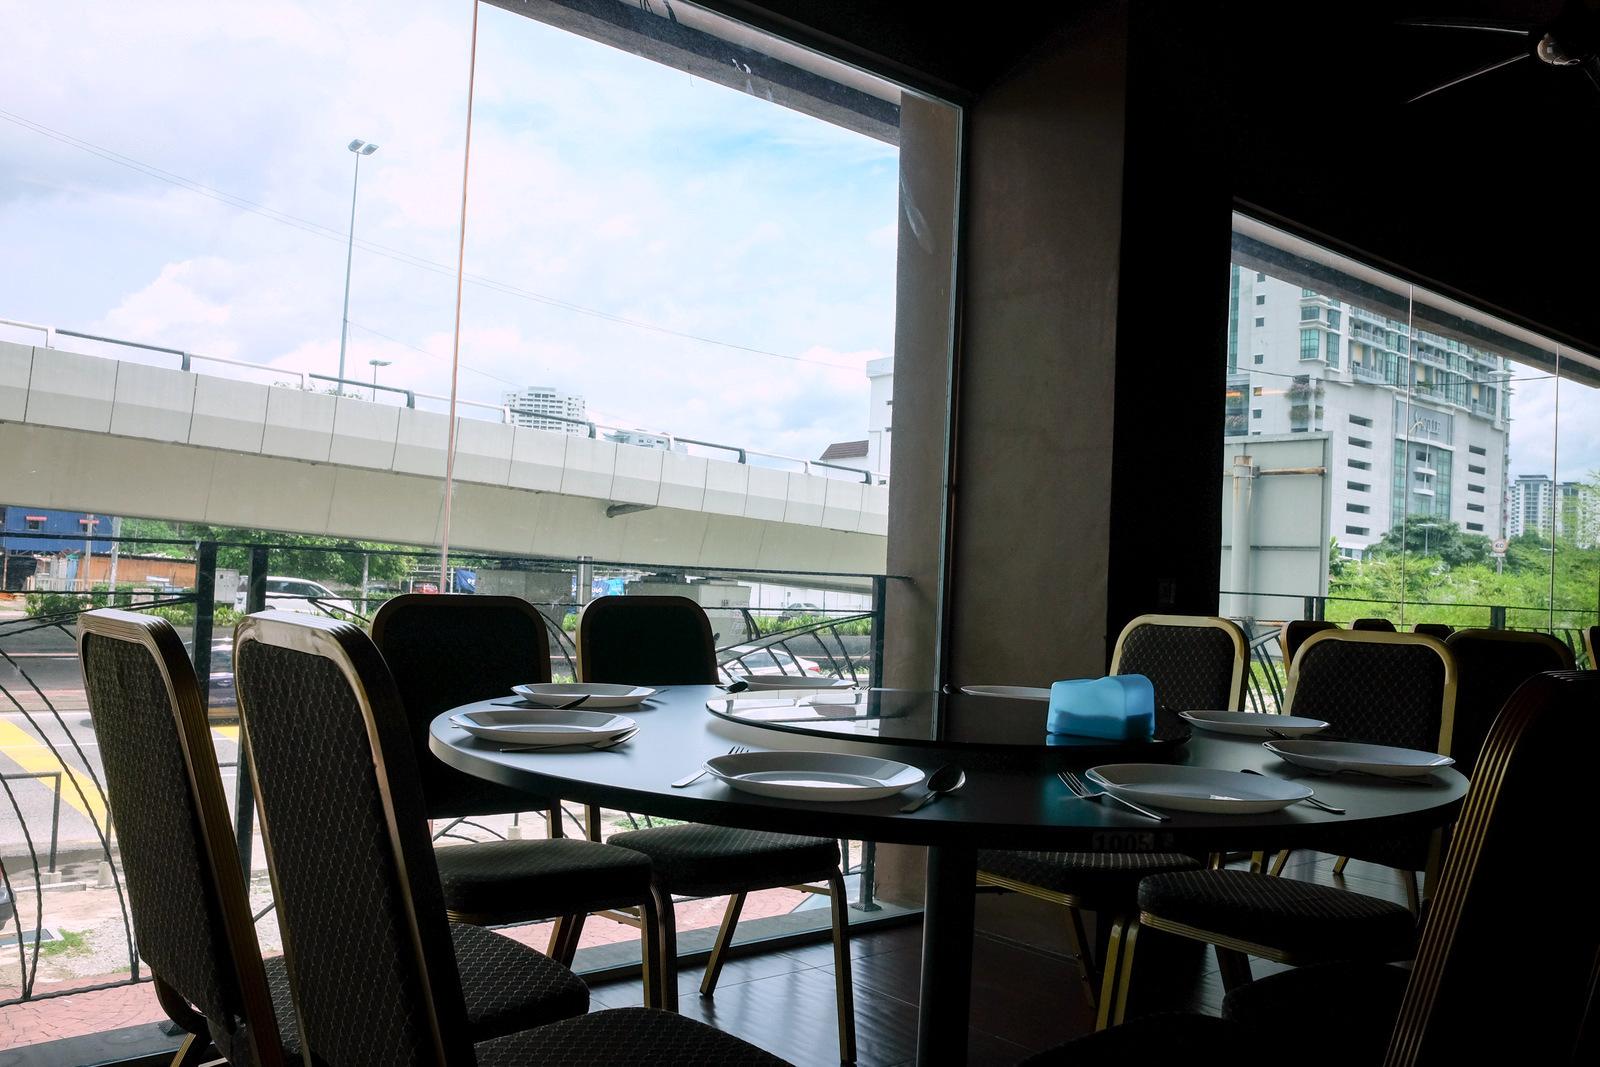 Best Vegetarian Restaurant In Old Klang Road